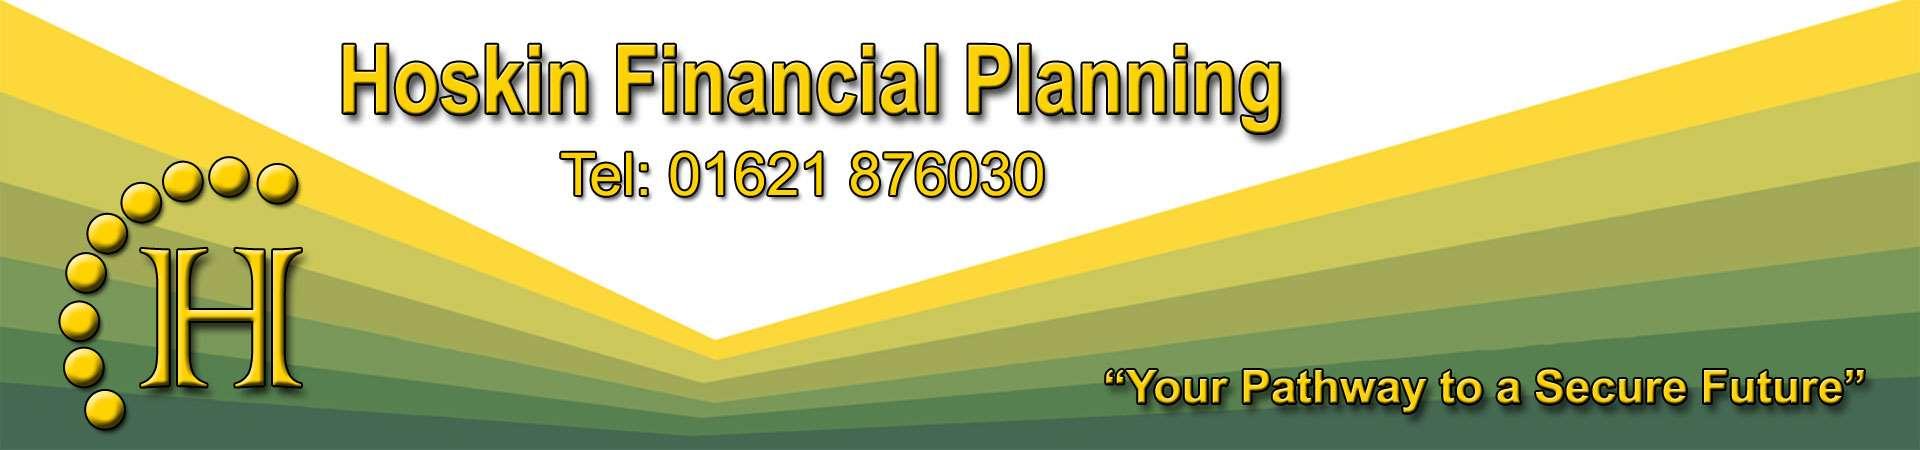 Hoskin Financial Planning